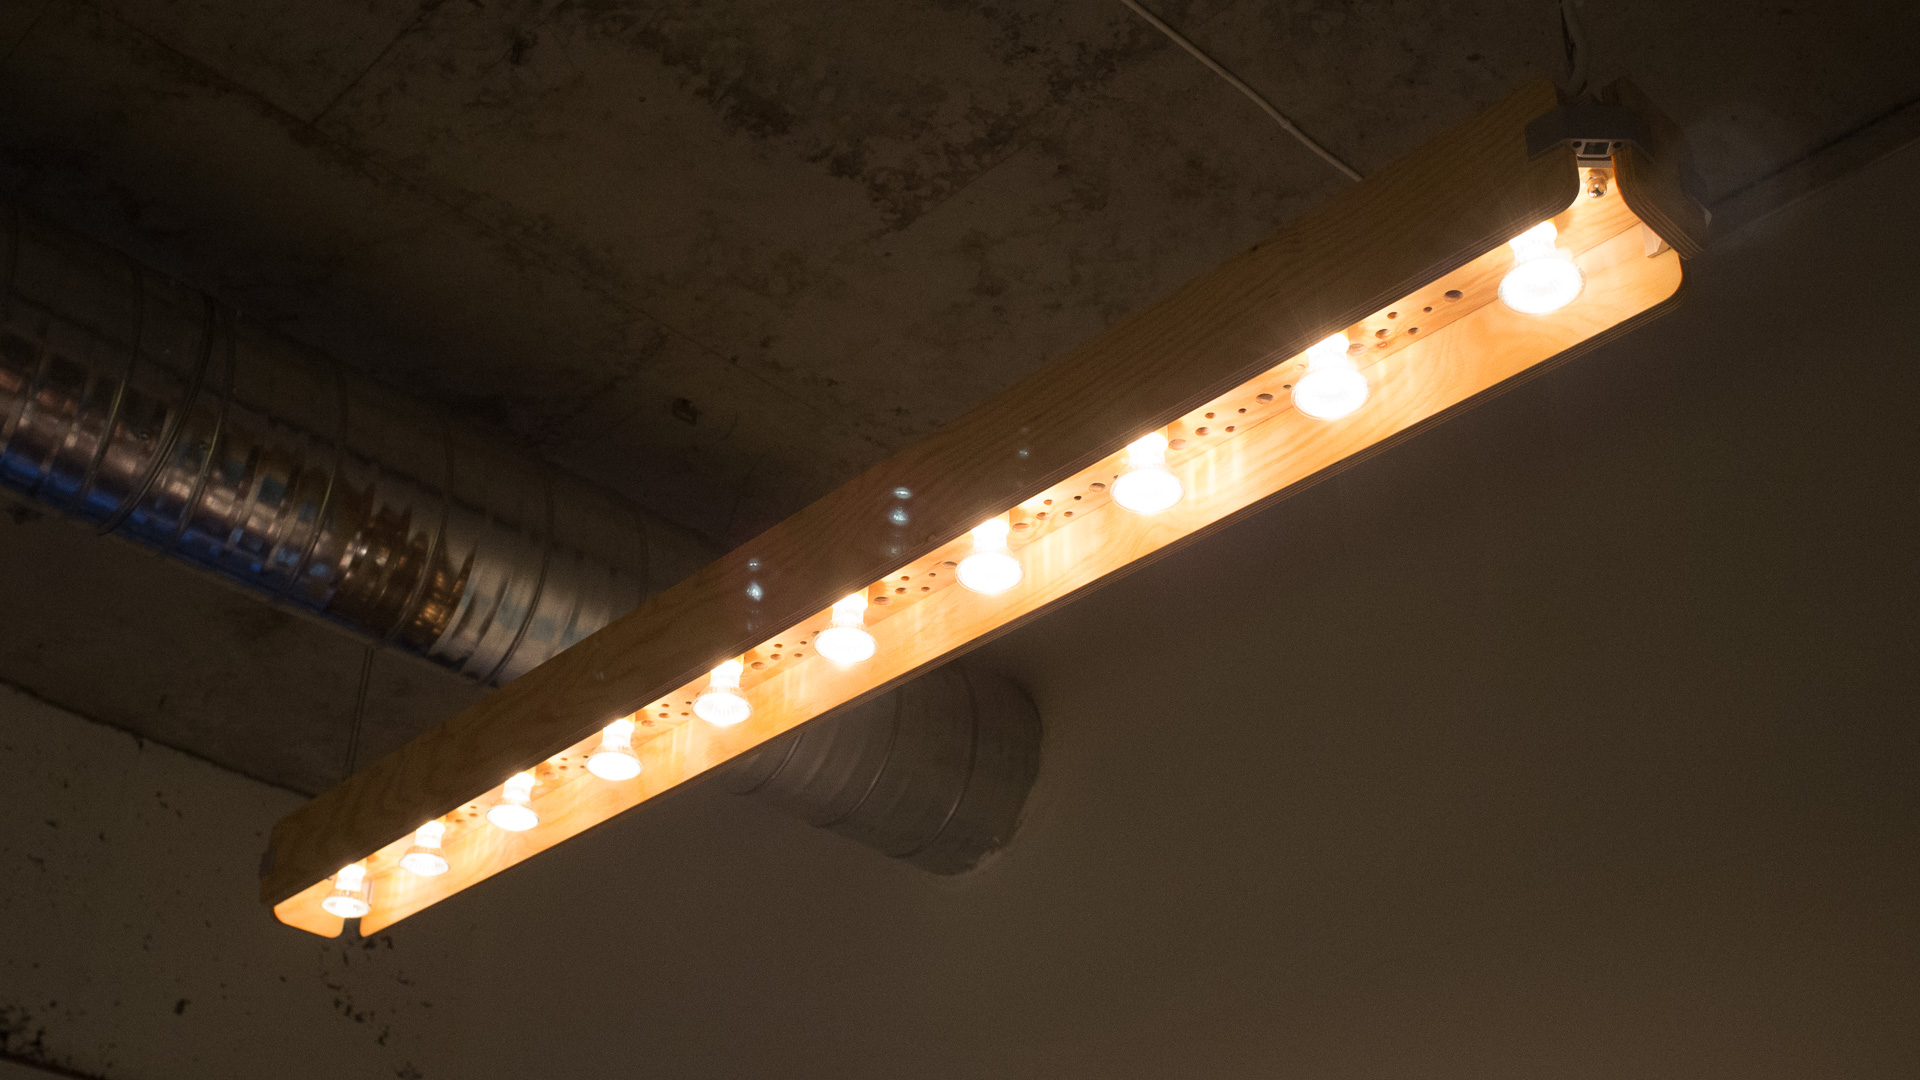 office light fixture. DSCF8585 Office Light Fixture